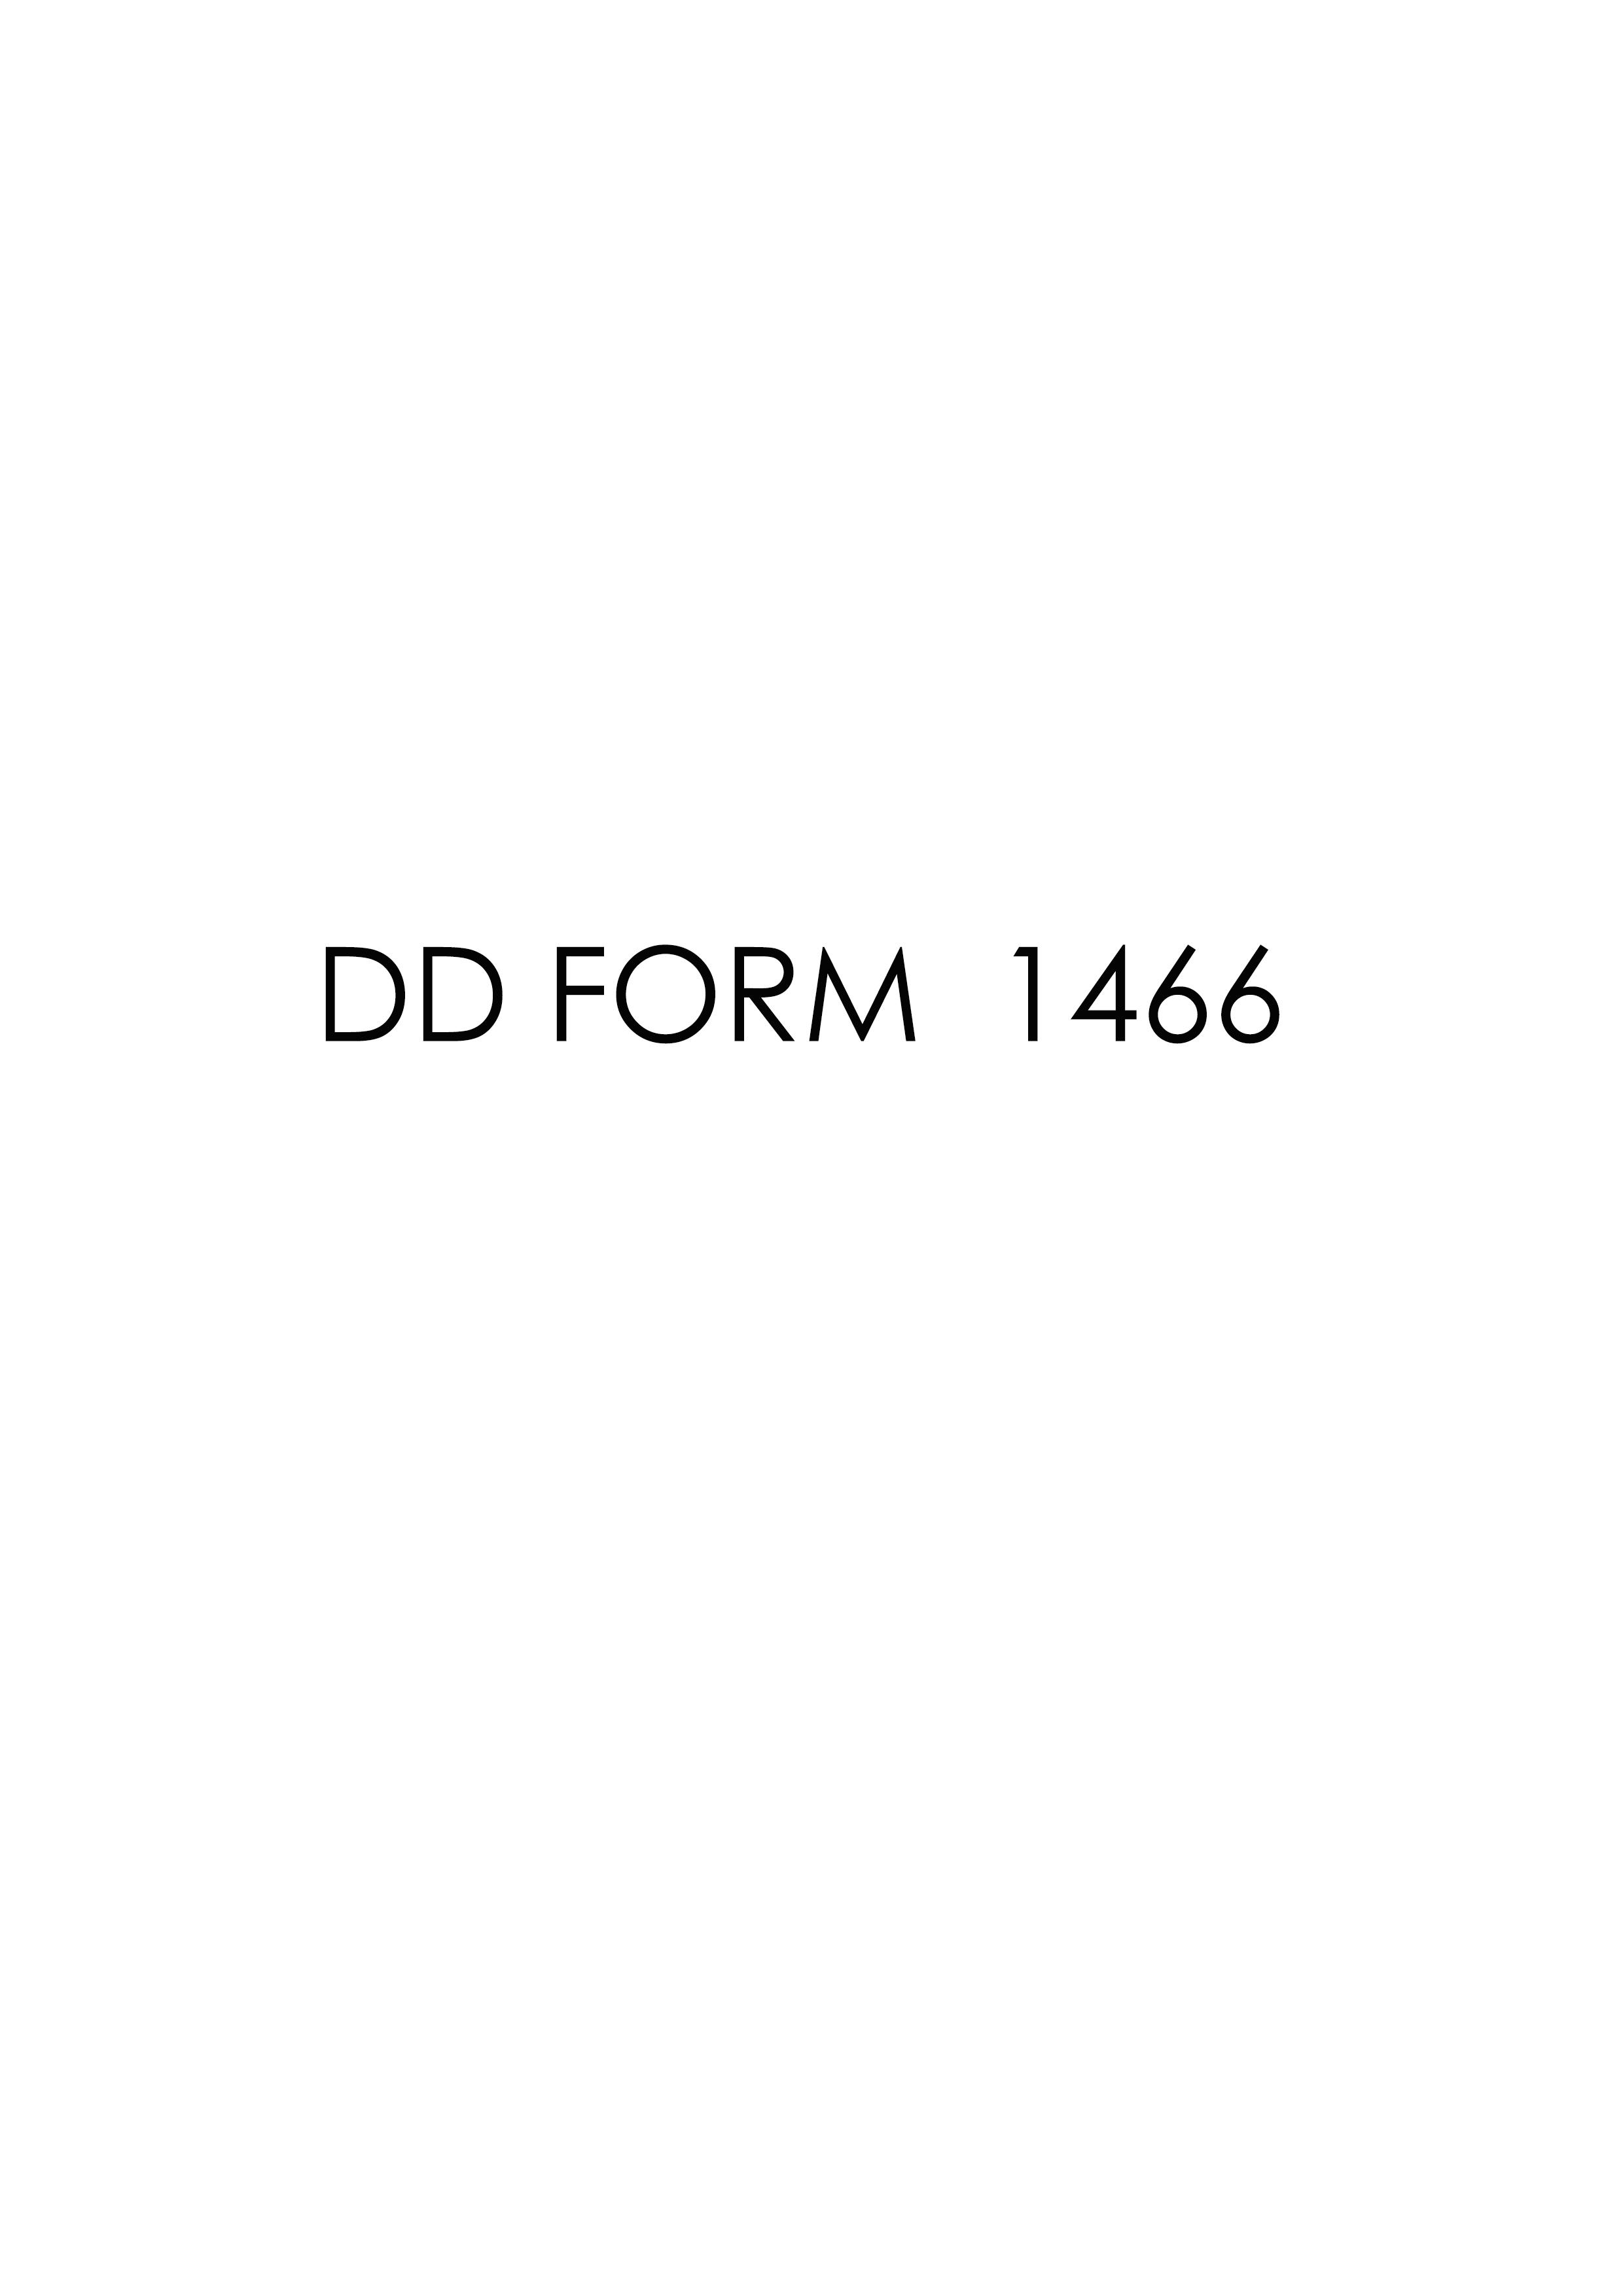 Download dd Form 1466 Free